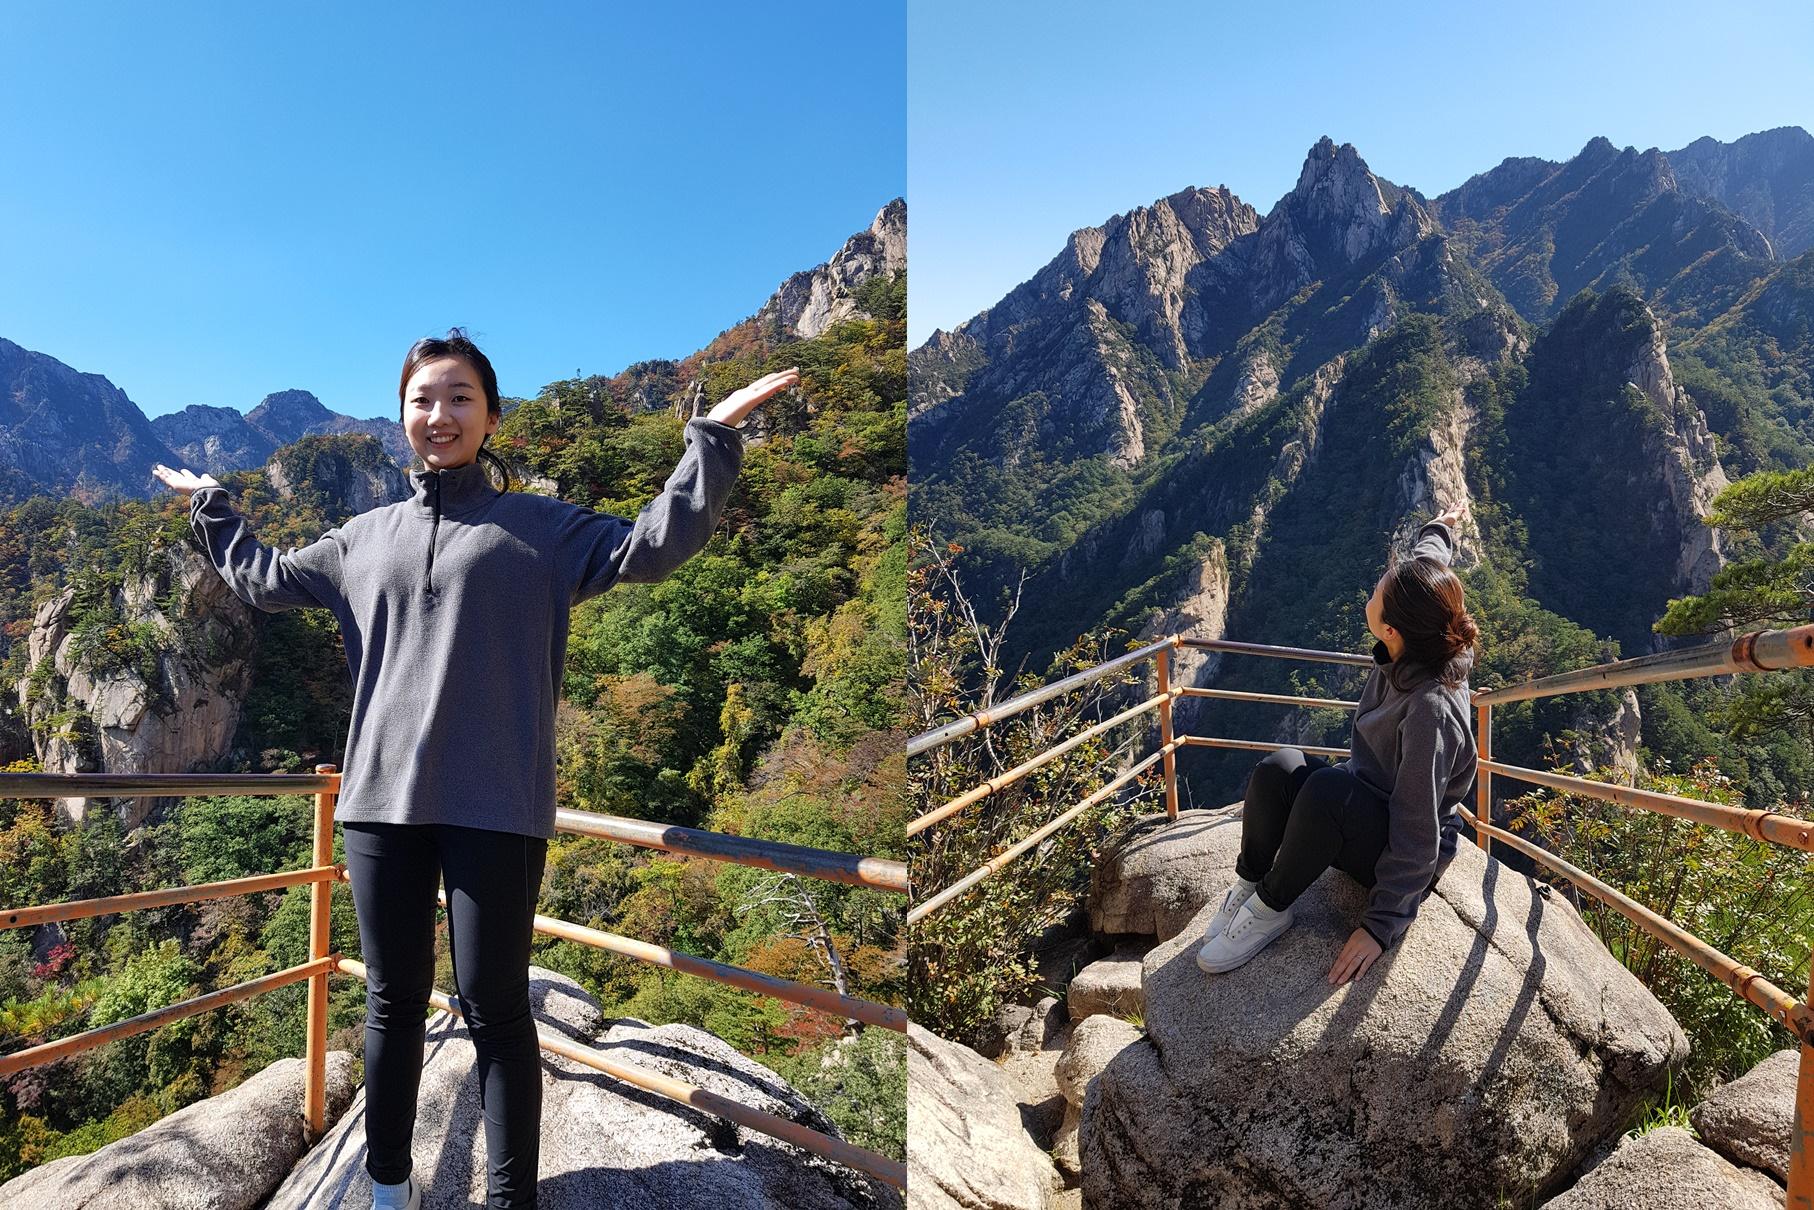 Feel the nature in the Seoraksan Mountain!(설악산 국립공원)